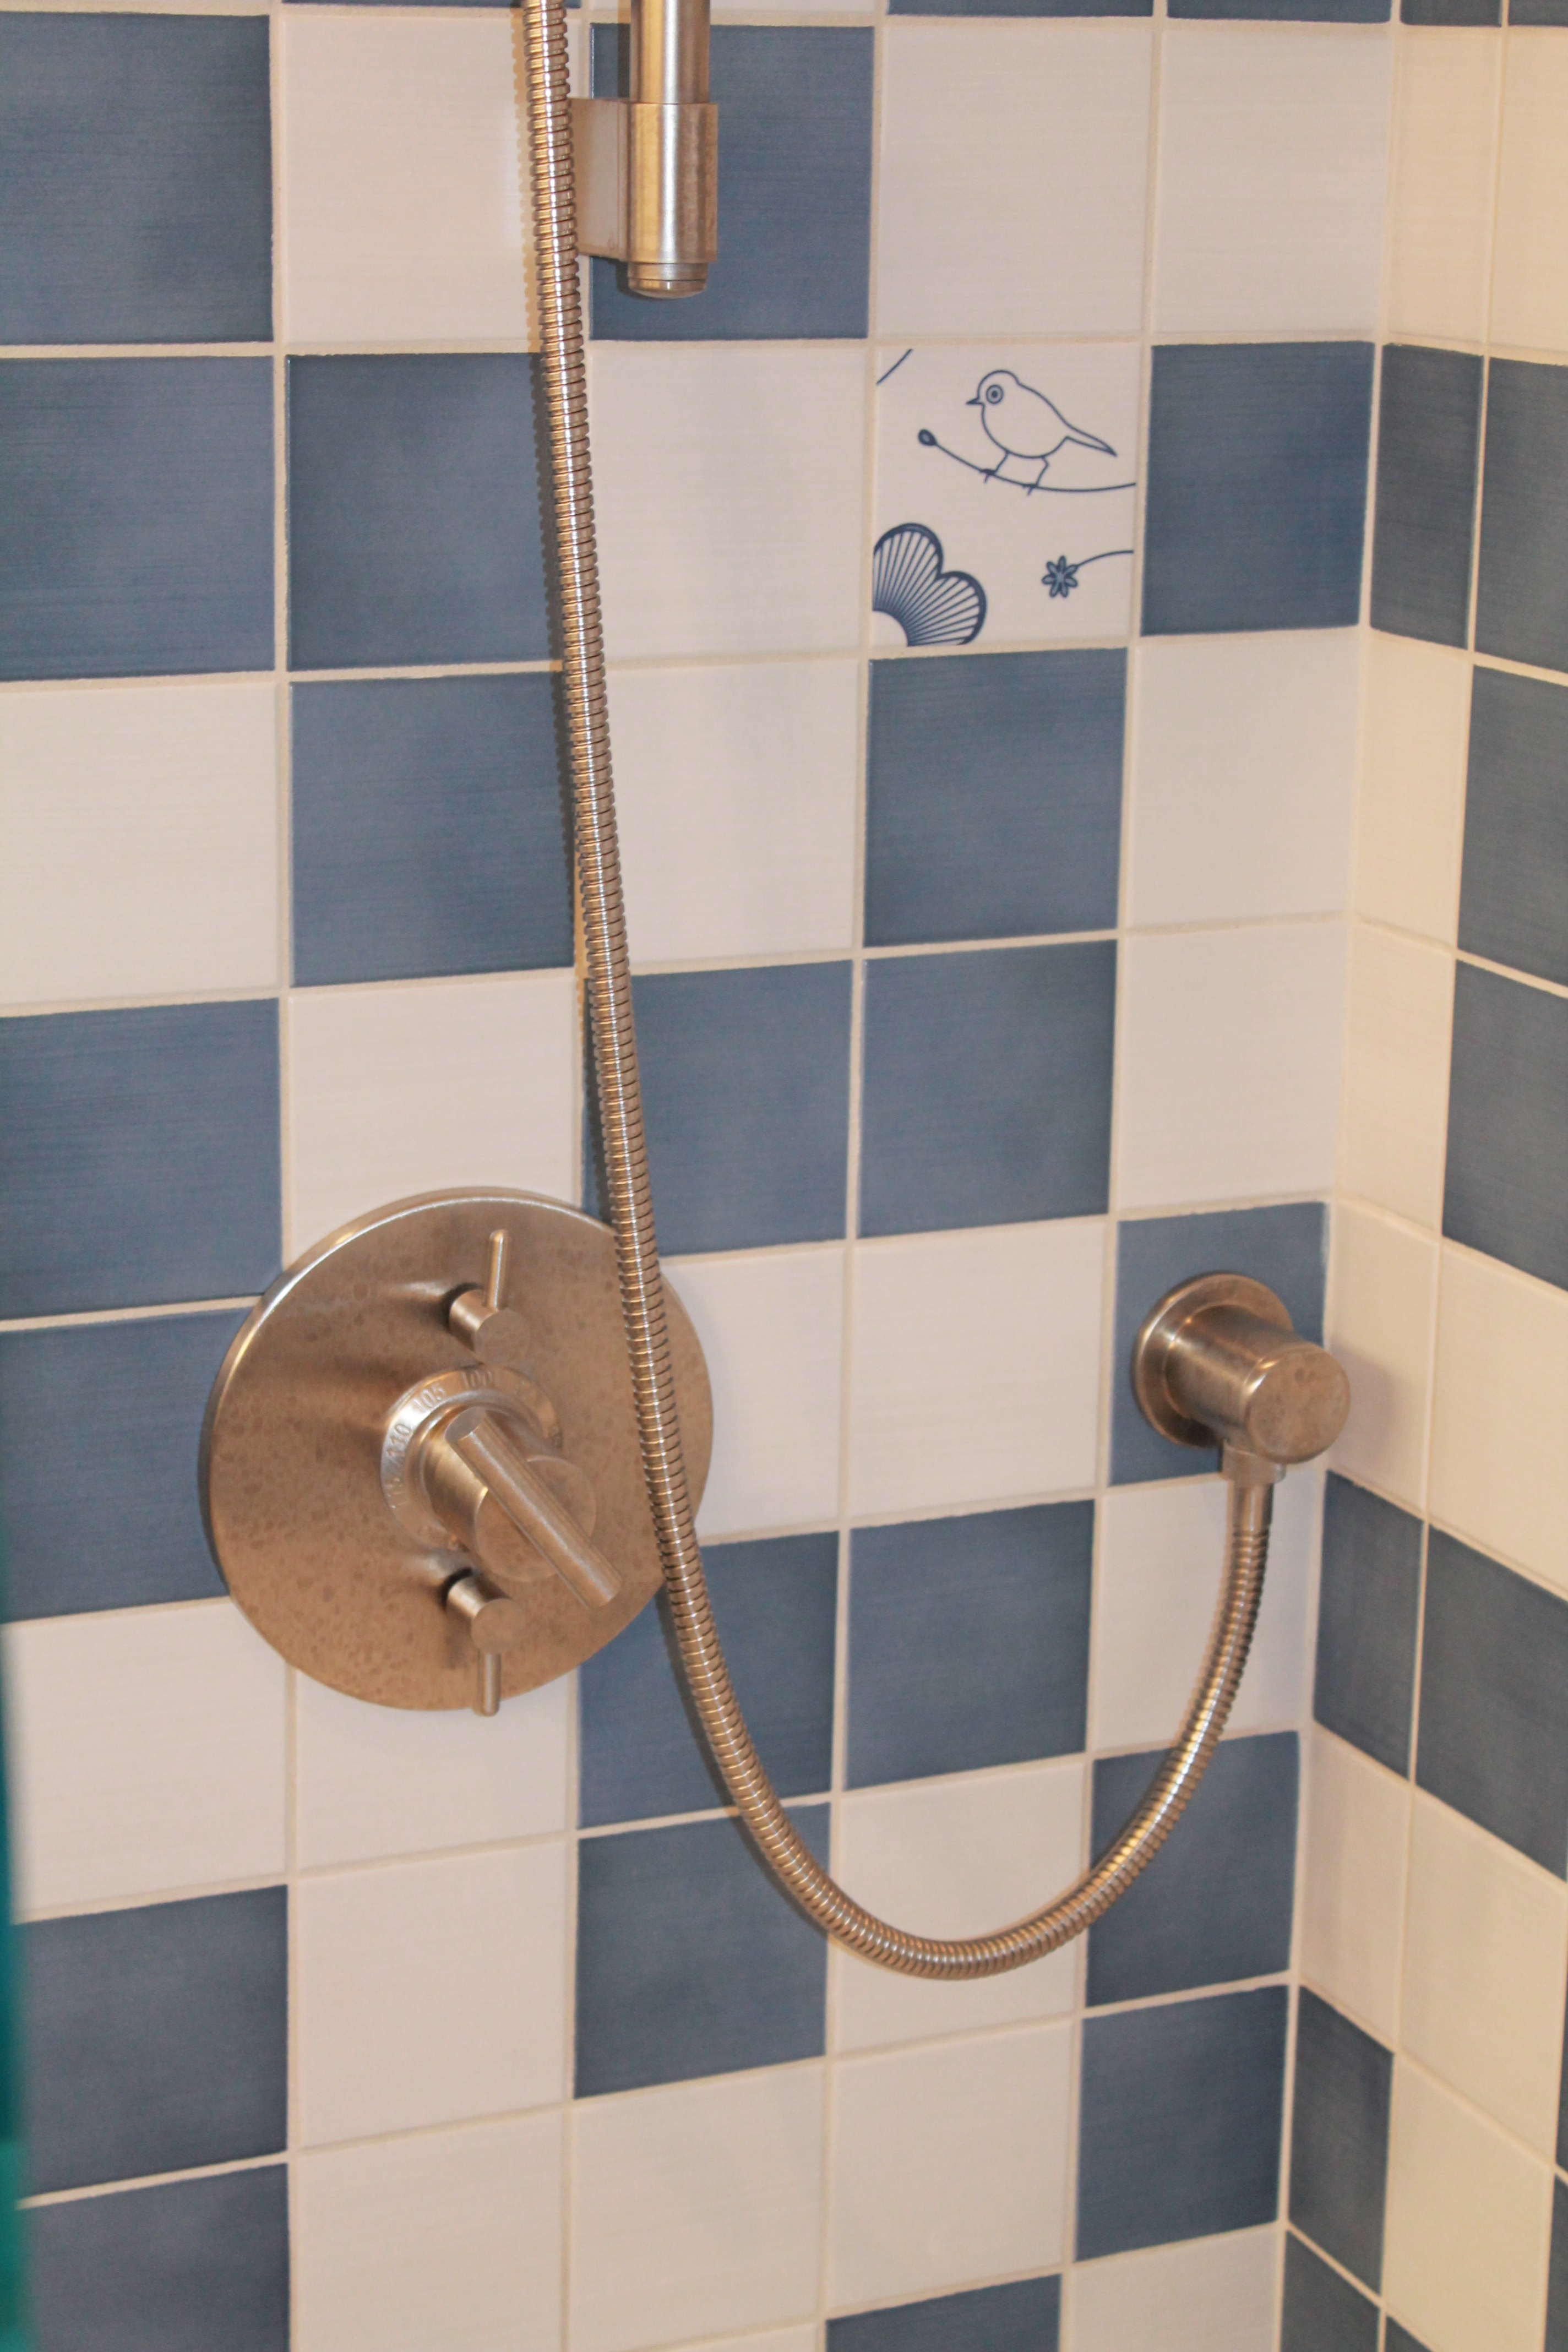 Bathroom Faucets 3 7 Plumbed Elegance Plumbing Fixture Showroom